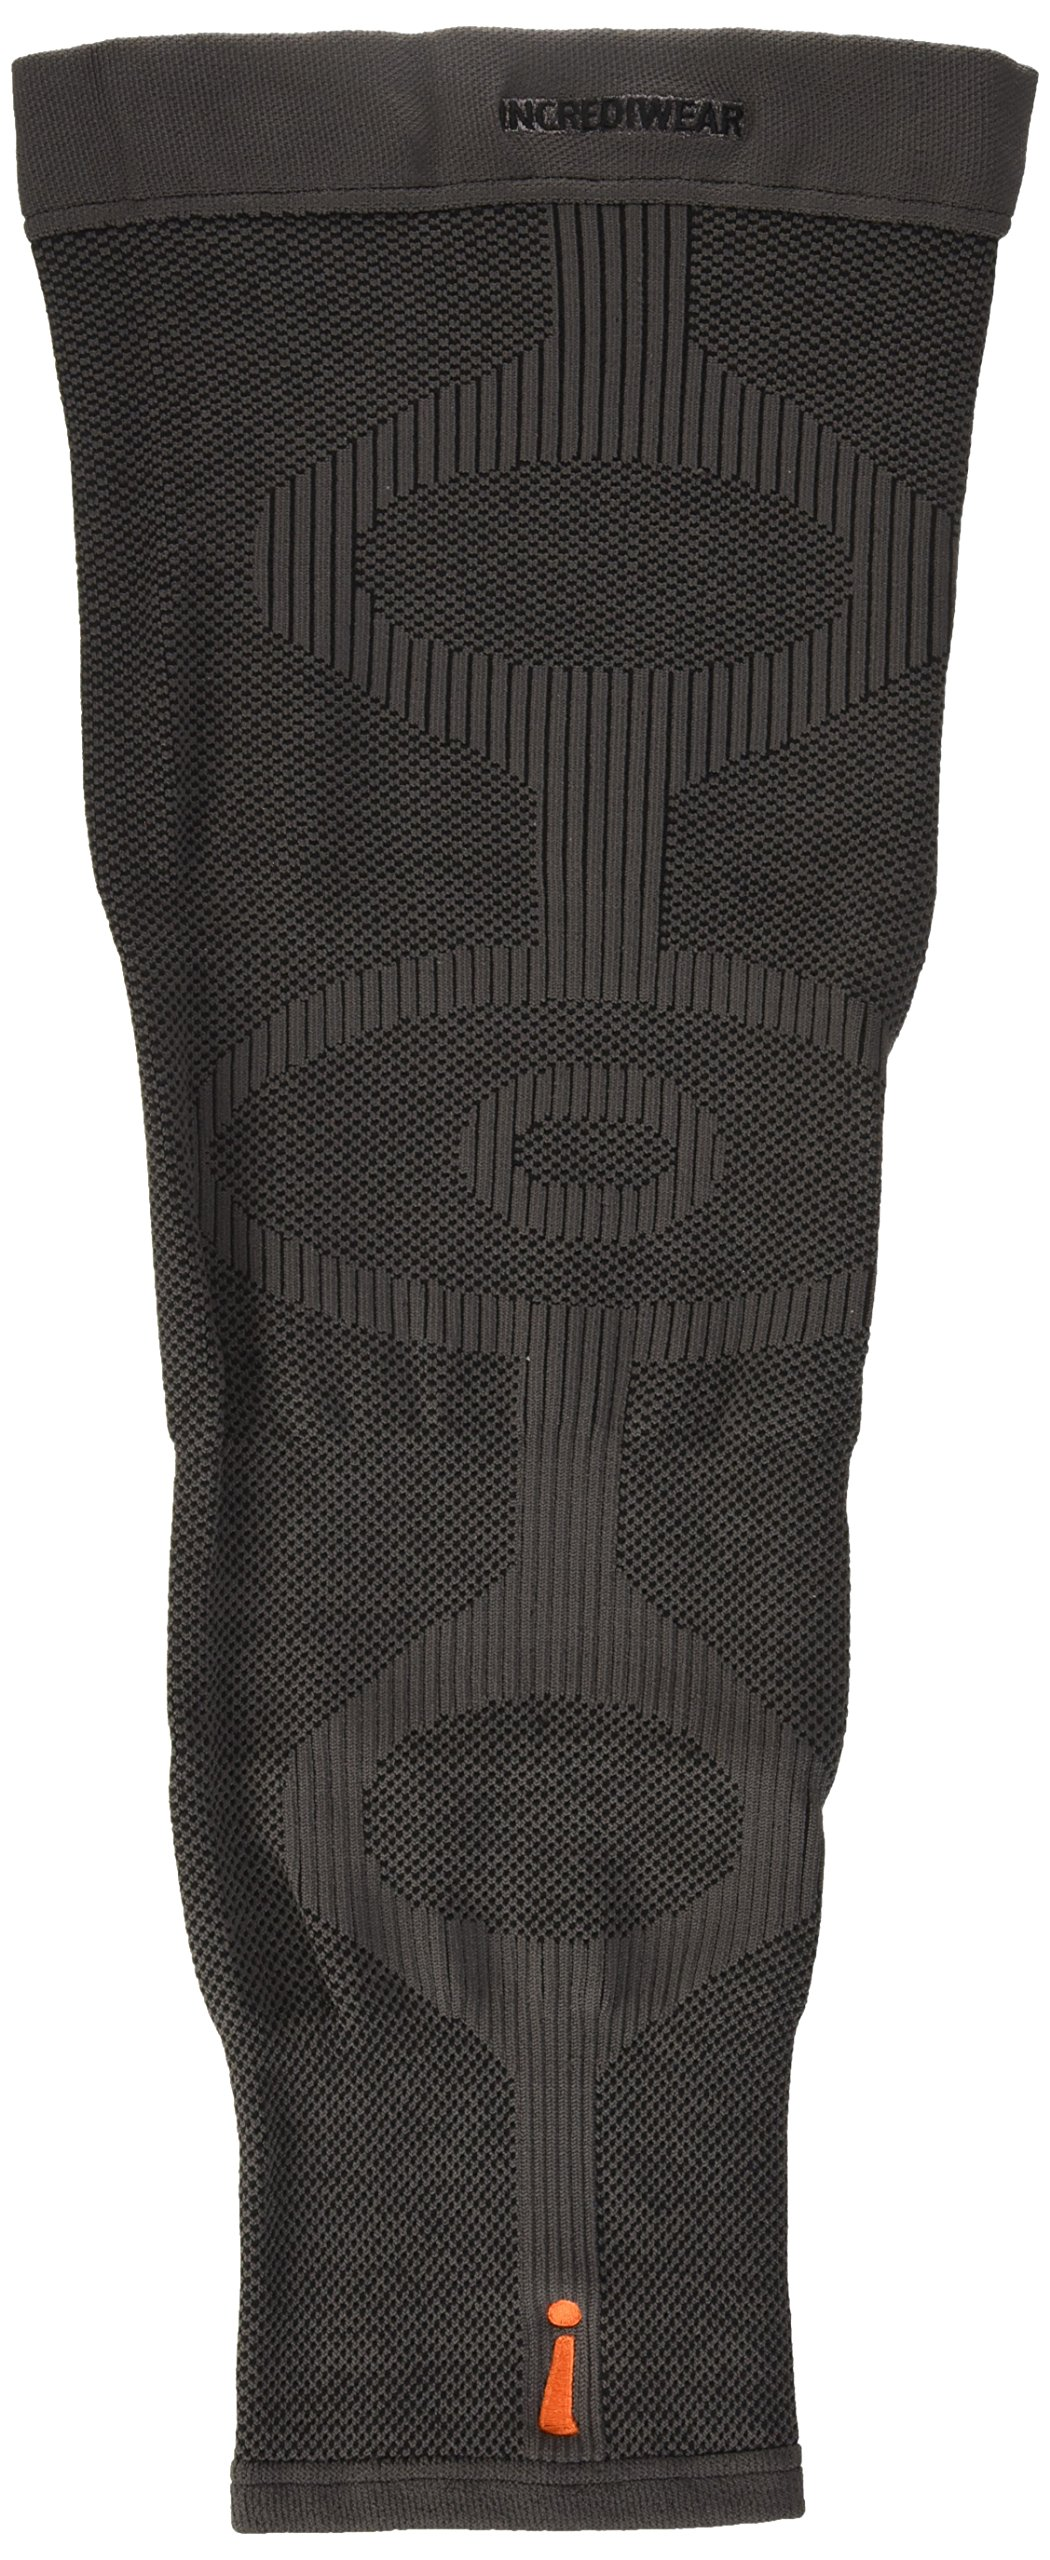 INCREDIWEAR Single Leg Sleeve, Charcoal, X-Large, 0.03 Pound